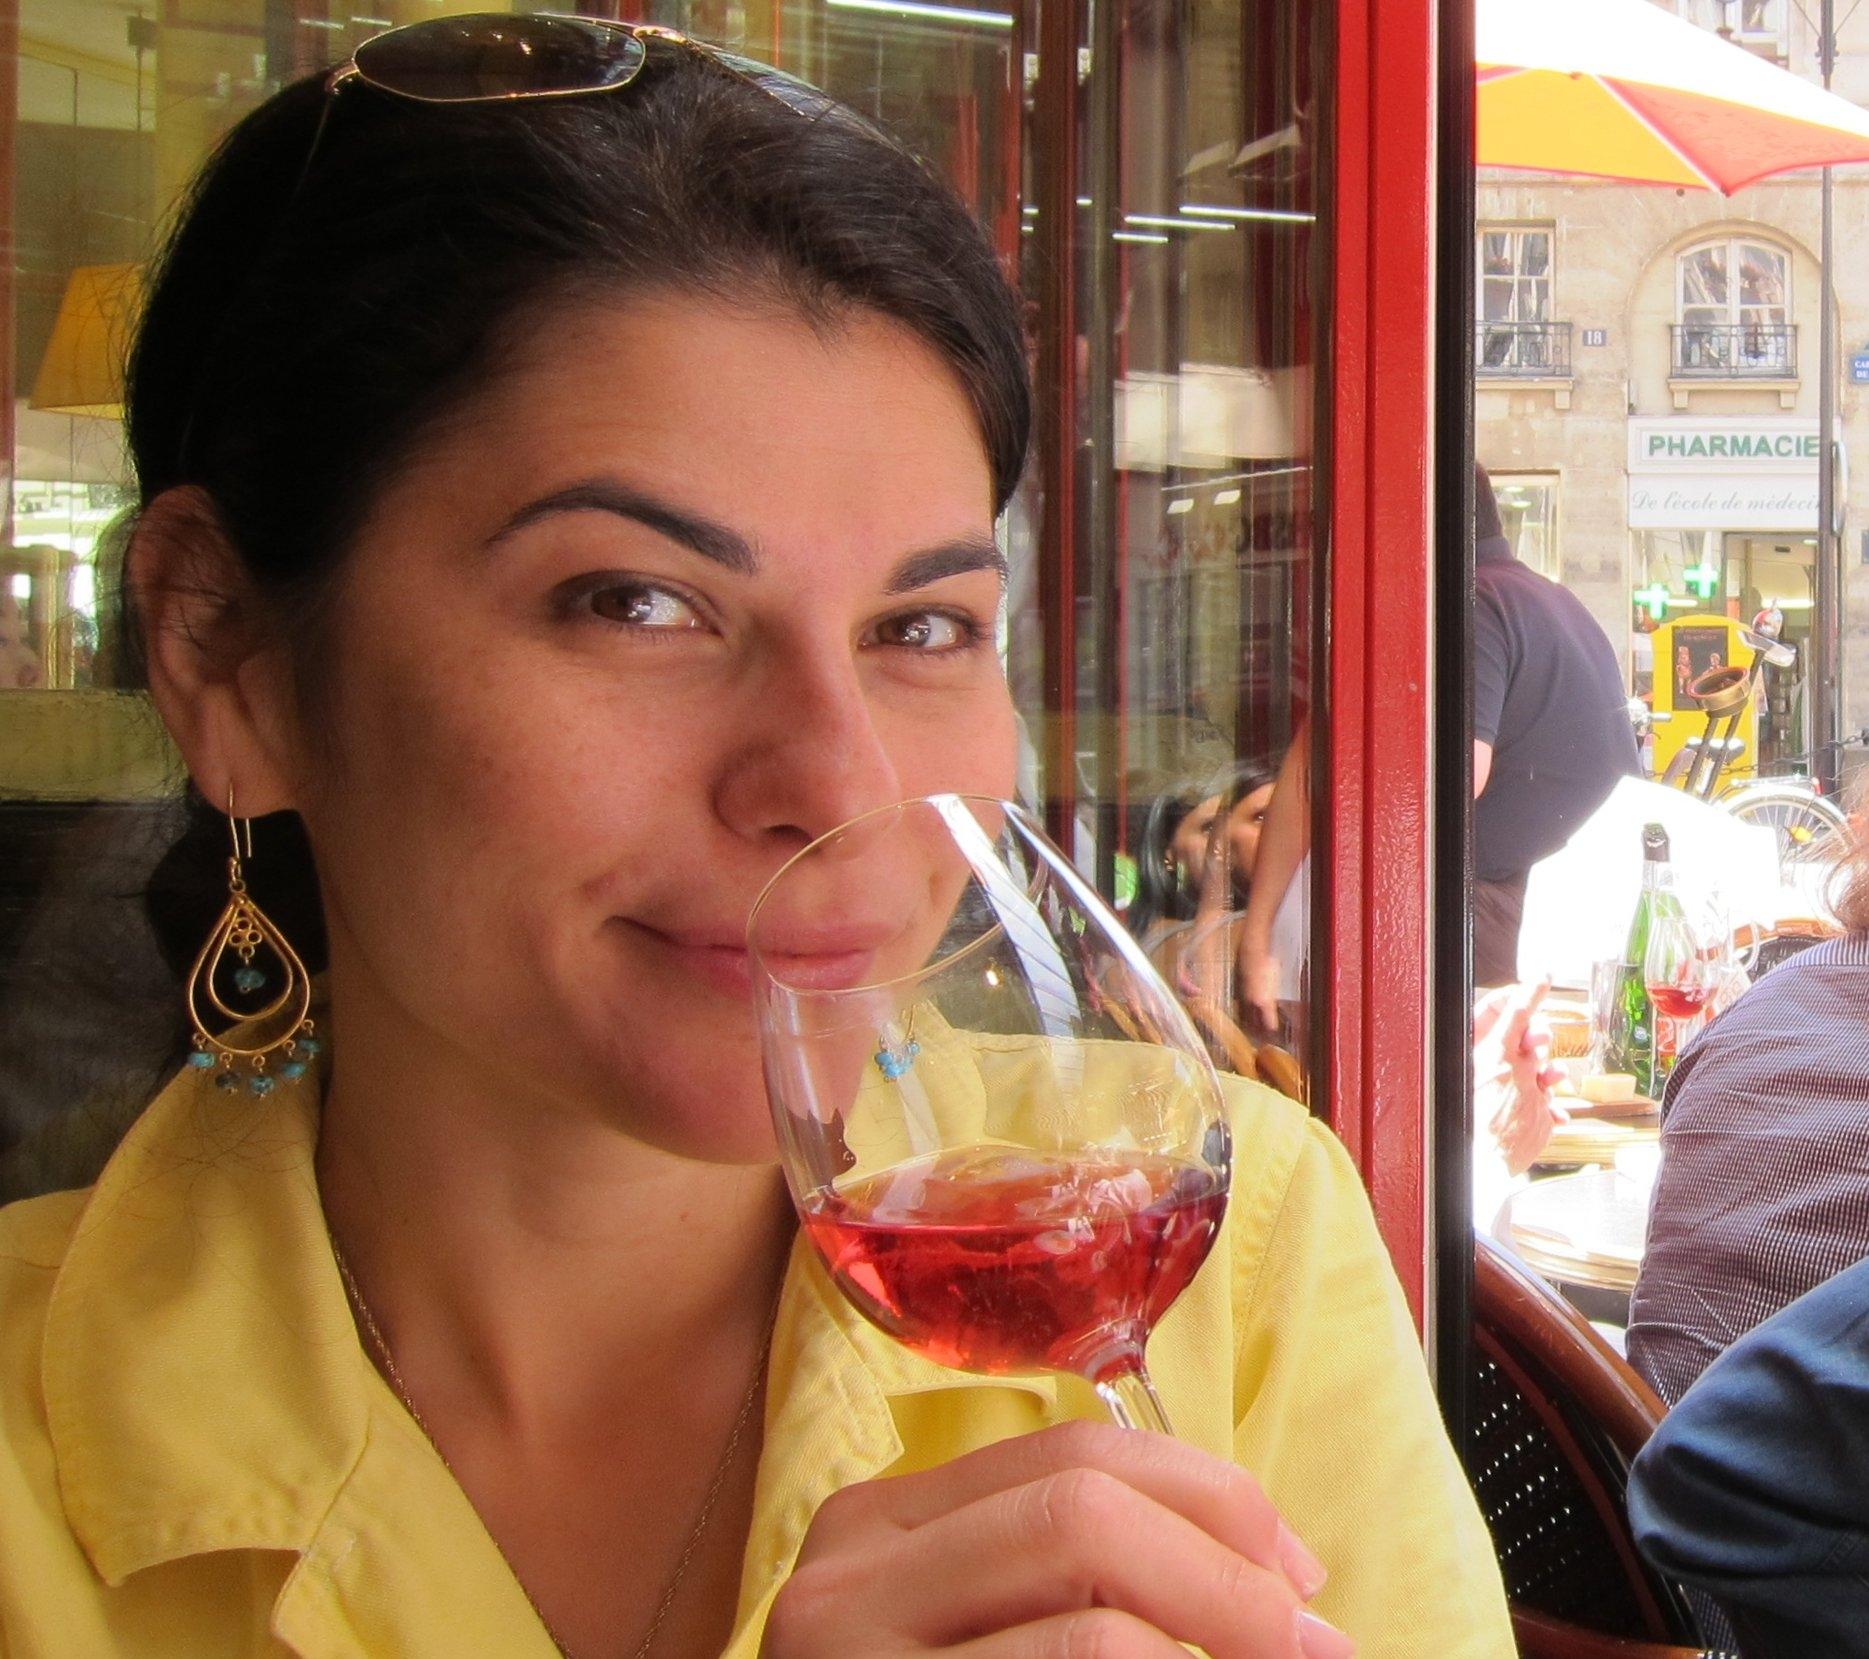 Nilou Le Comptoir yellow top sipping wine no logo.JPG